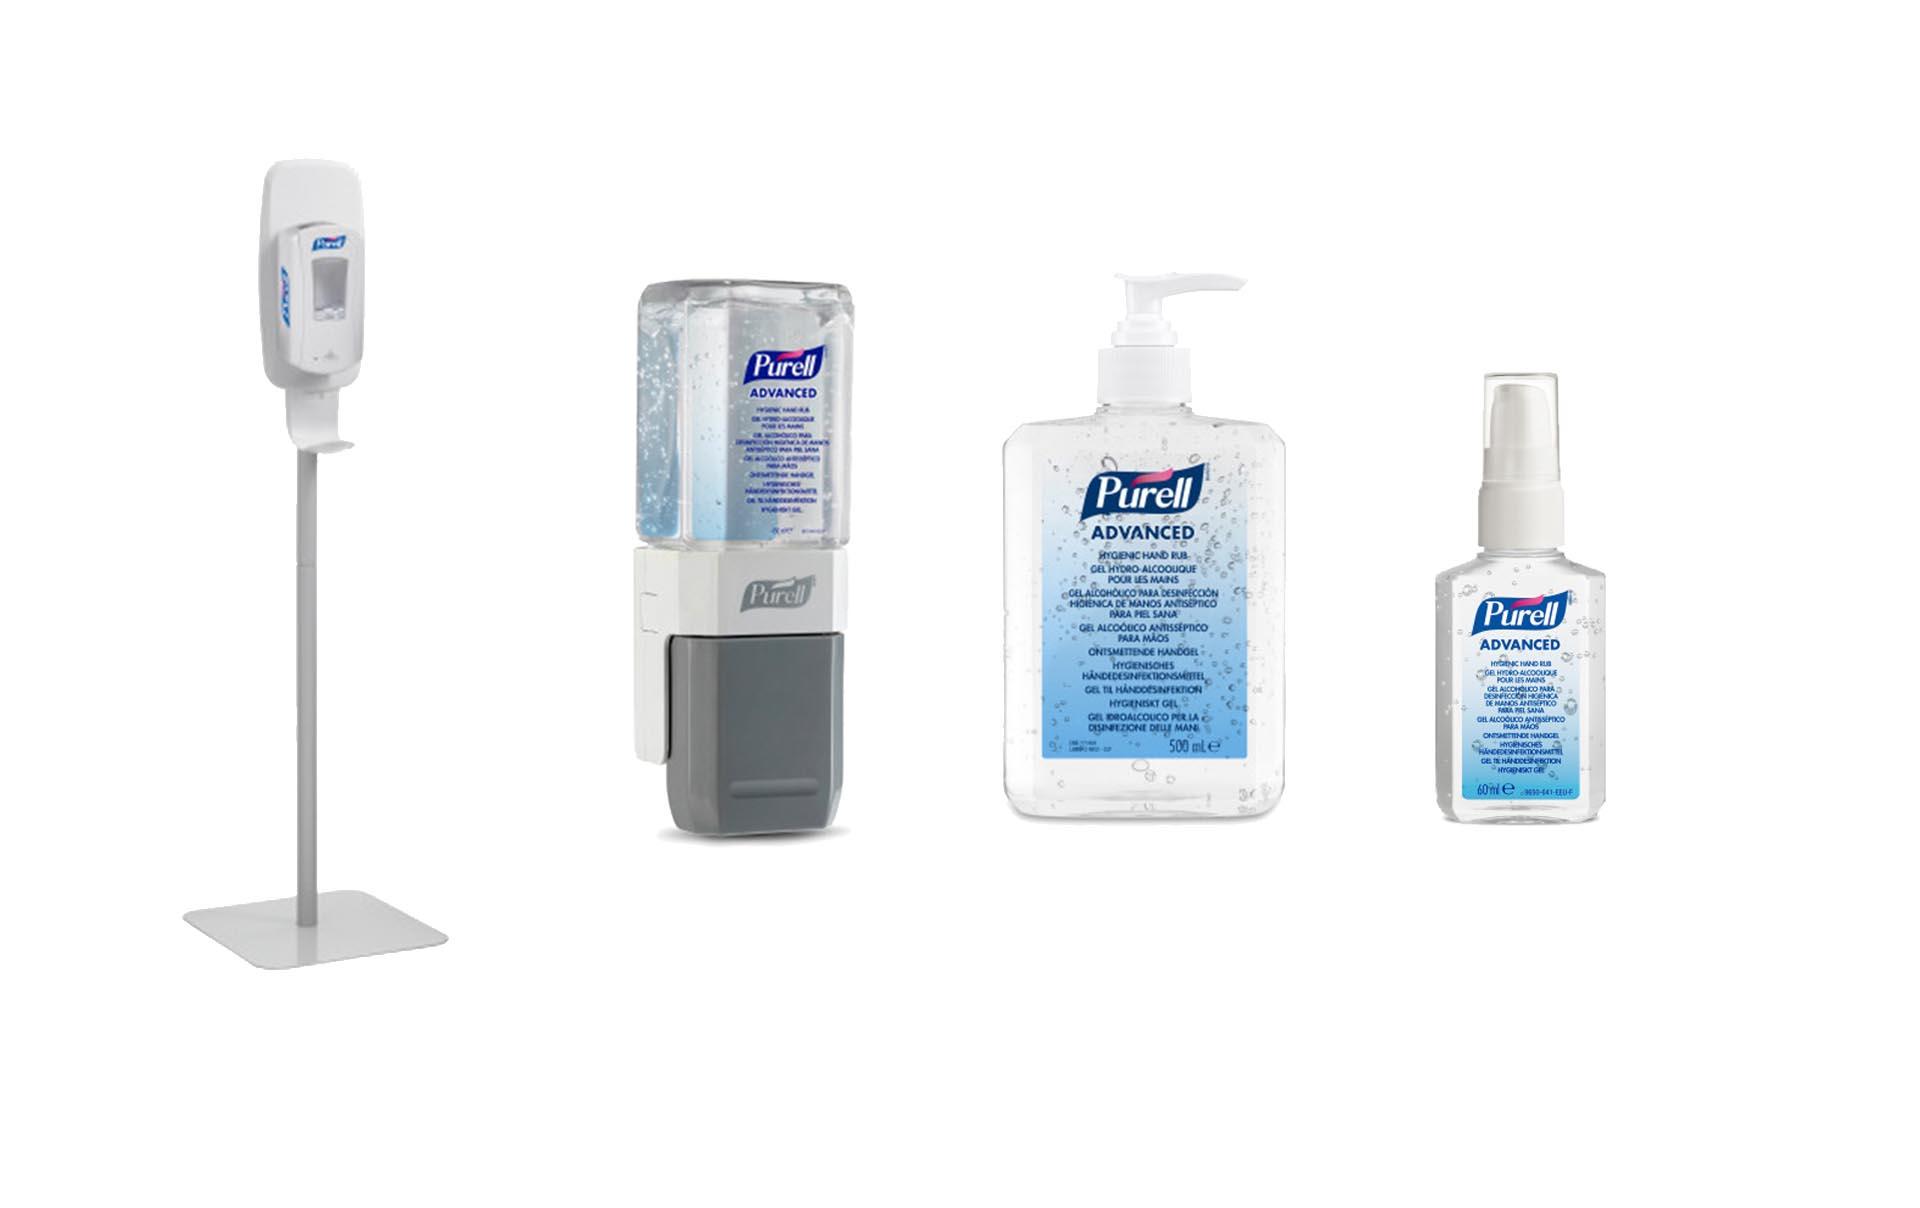 papelmatic-higiene-professional-gel-desinfectant-purell-mestres-escoles-format-purell